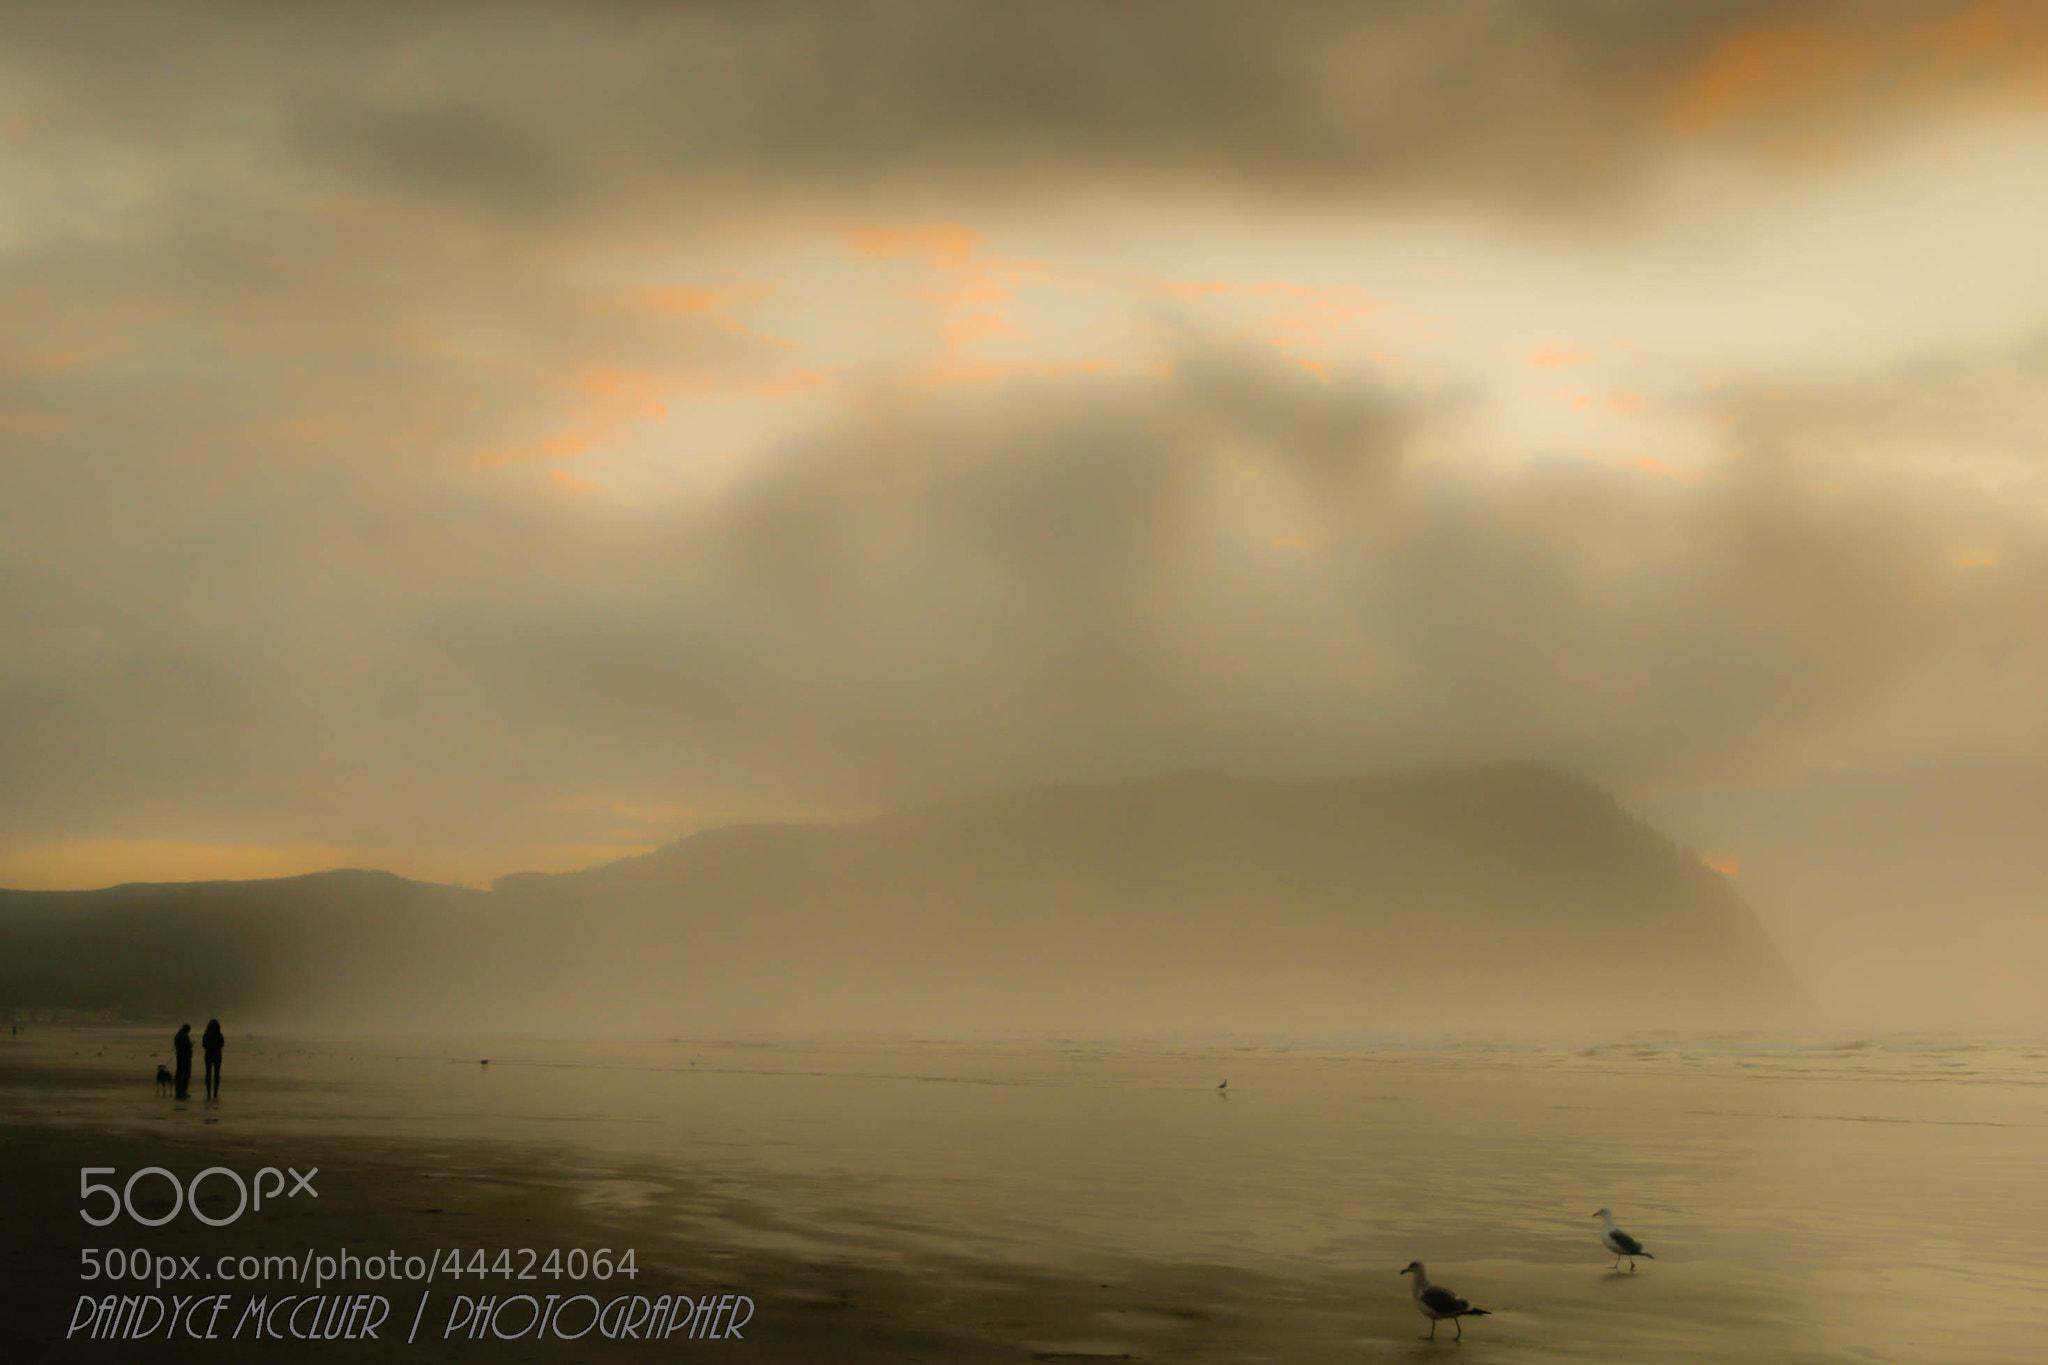 Photograph Foggy Beach Strollers by Pandyce McCluer on 500px